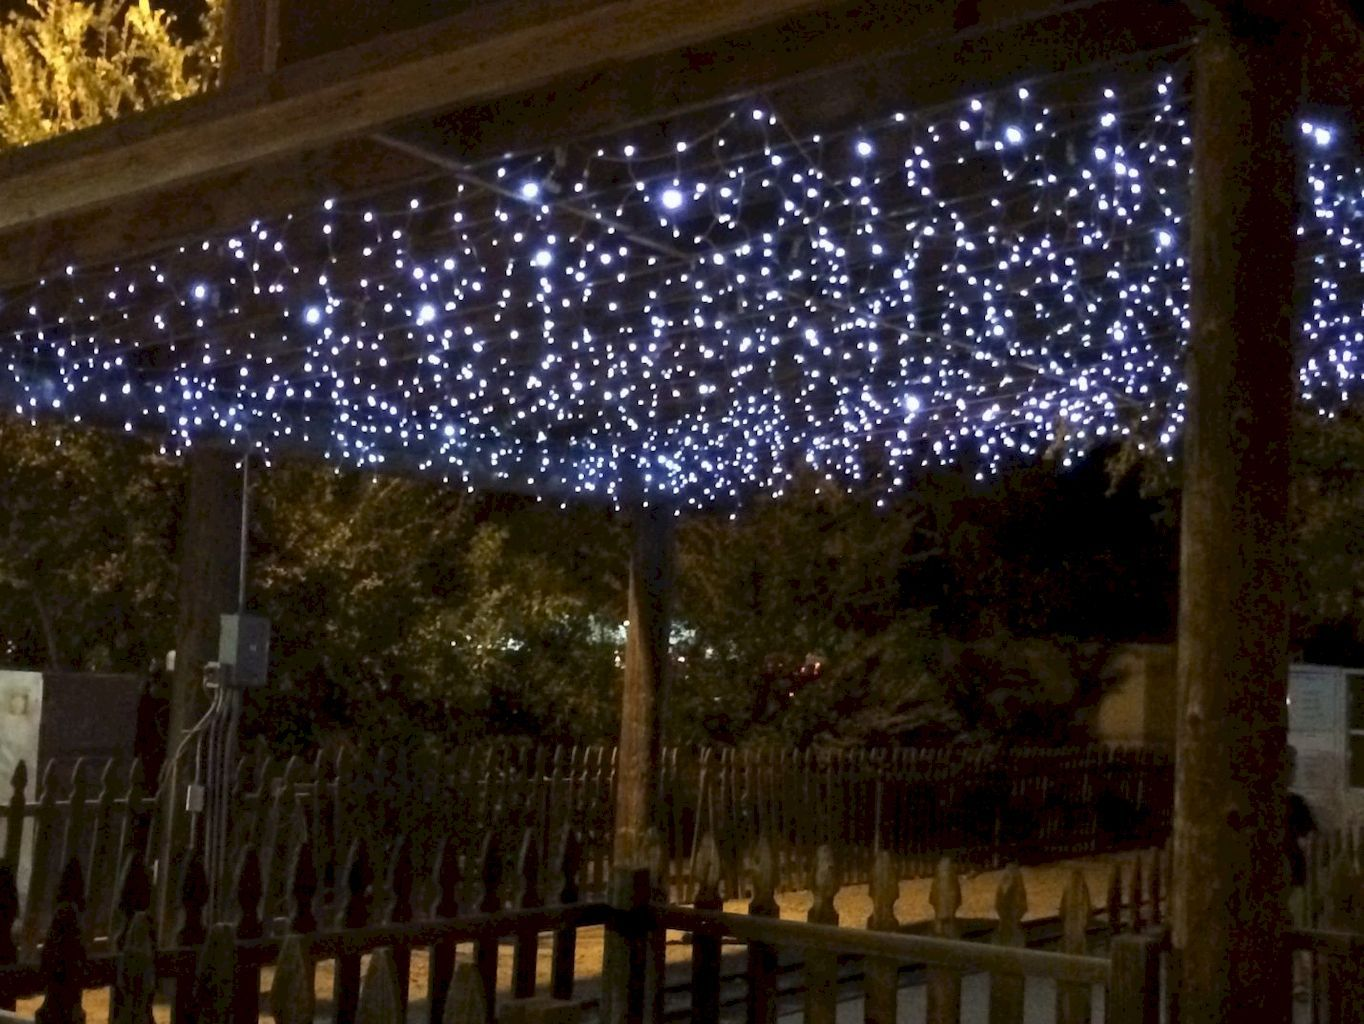 Outdoor Christmas Lights Decoration Ideas Home To Z Hanging Christmas Lights Christmas Light Installation Commercial Christmas Decorations